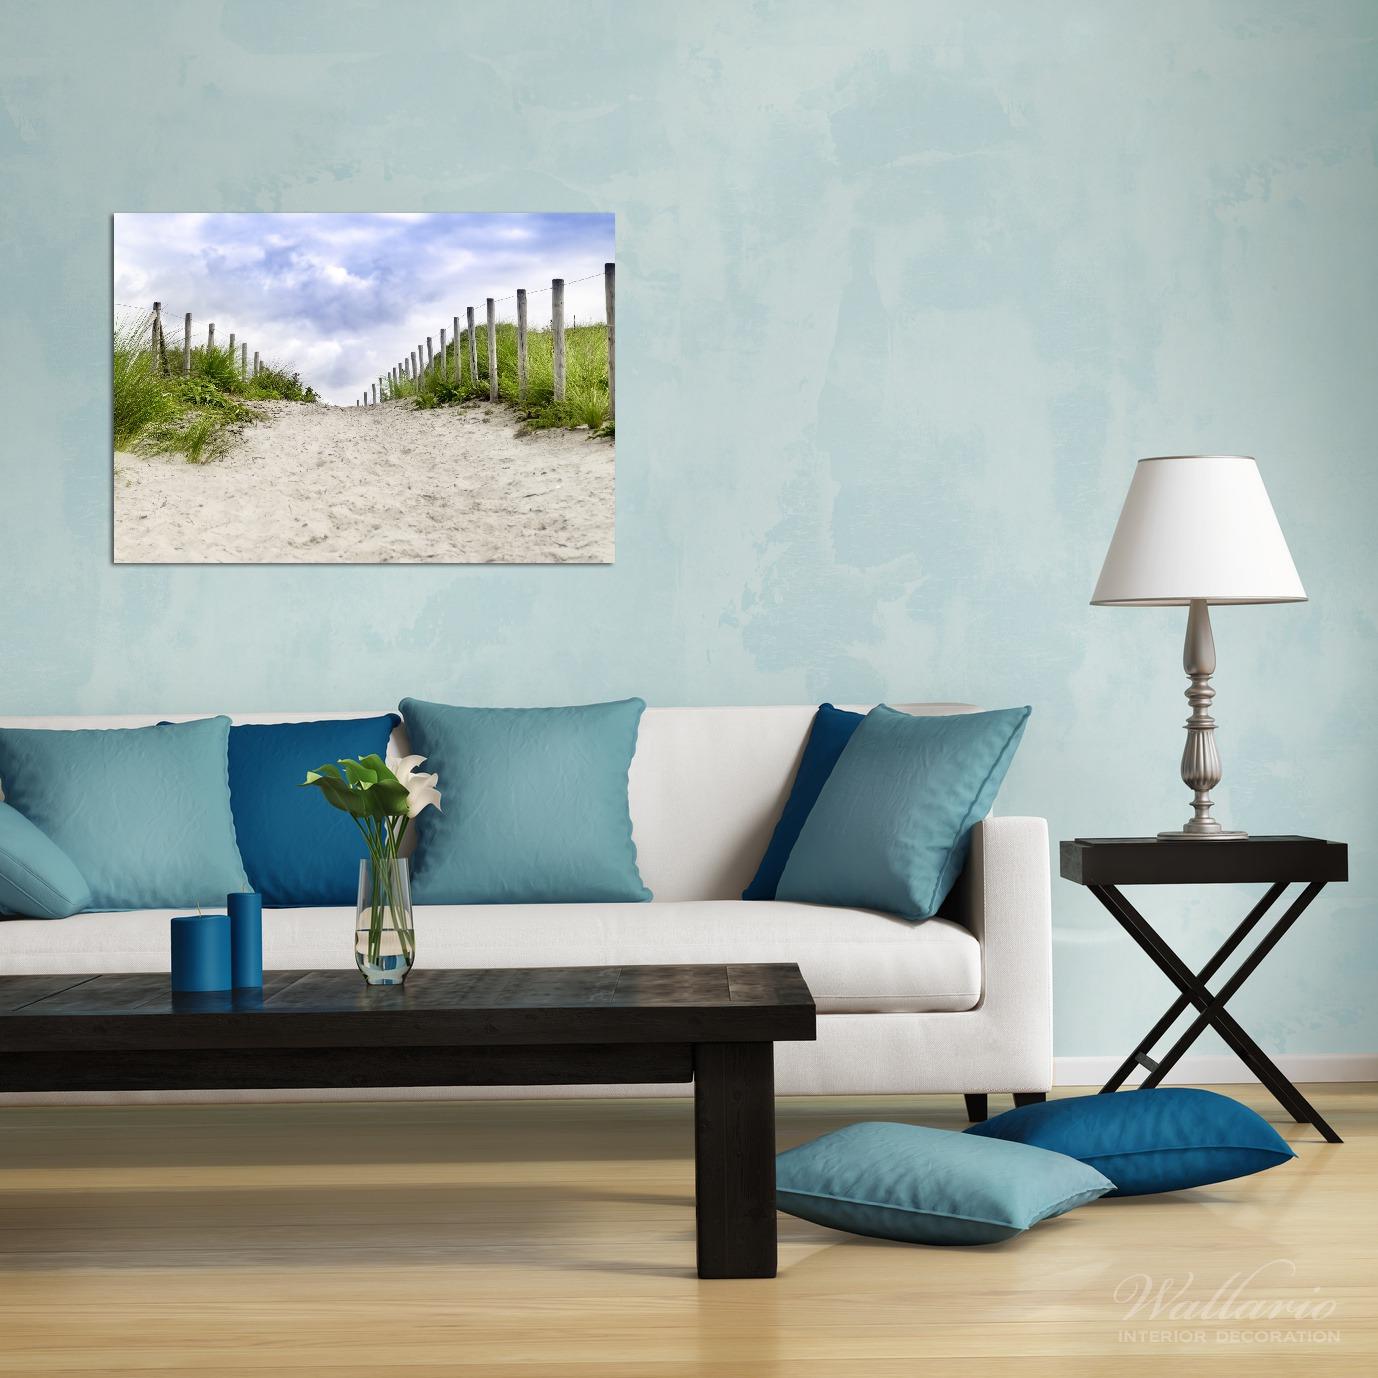 Wandbild Auf dem Weg zum Strand durch Dünen – Bild 2